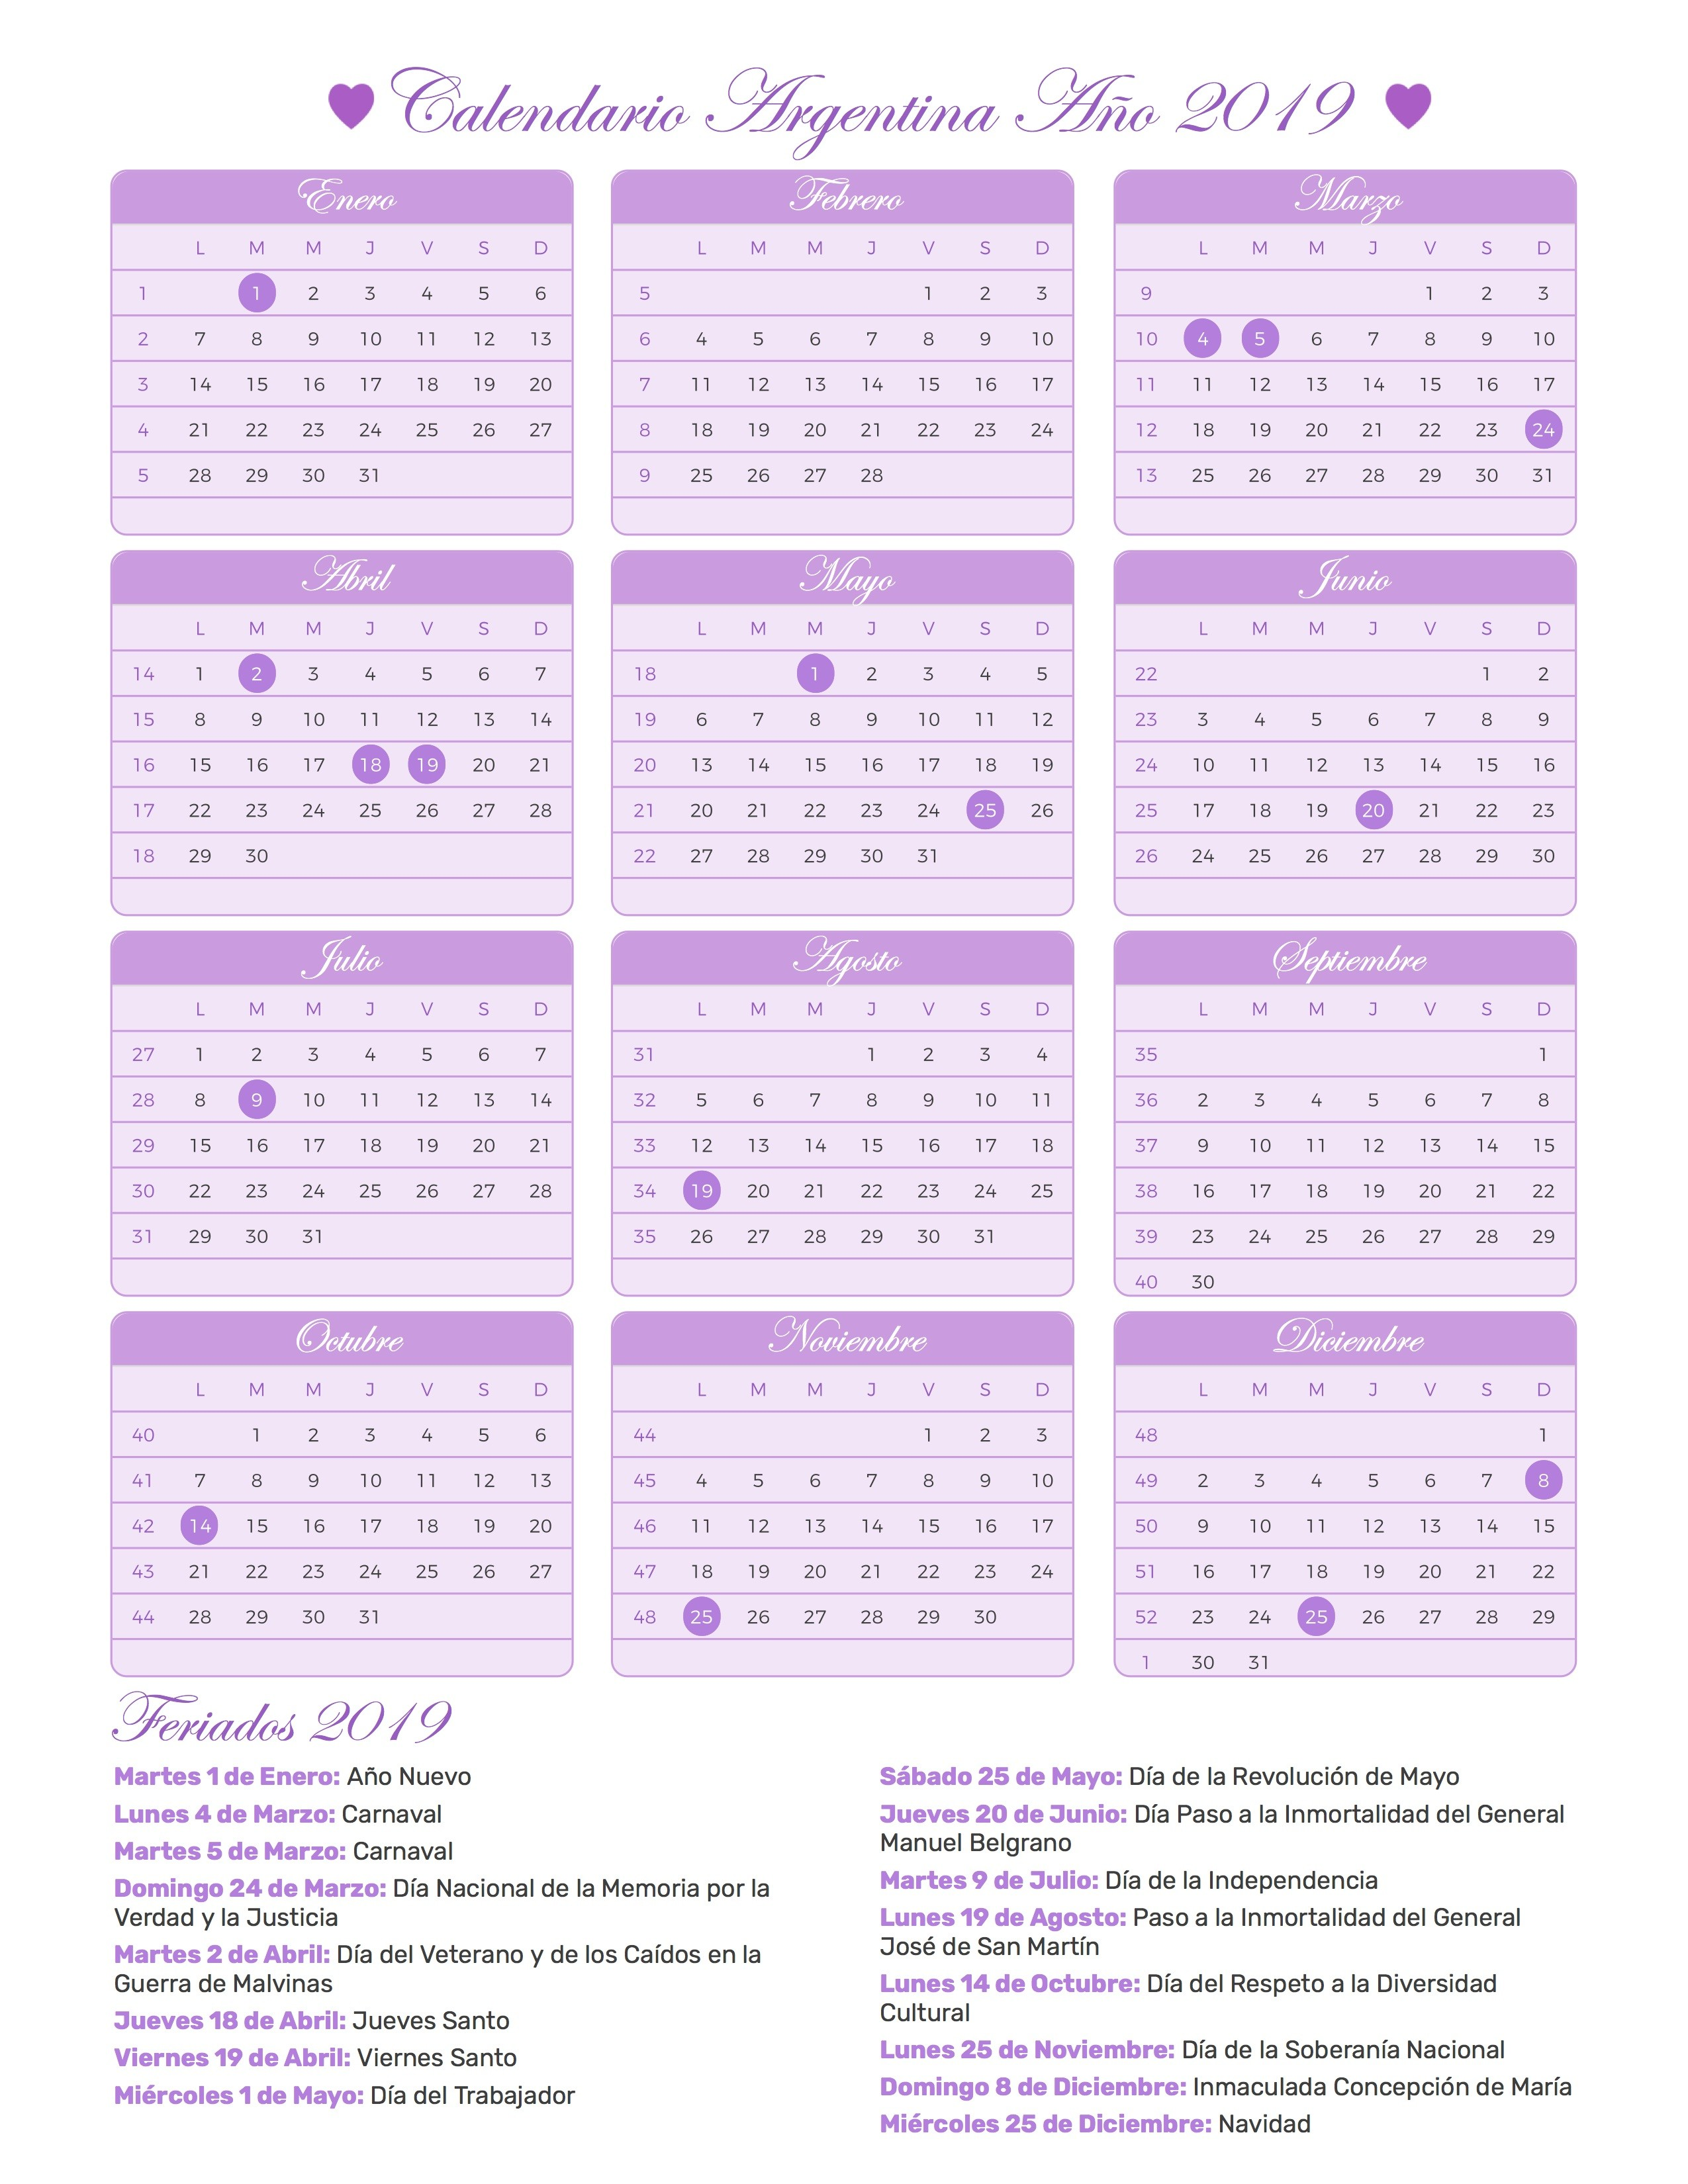 Calendario para Imprimir de Argentina con feriados 2019